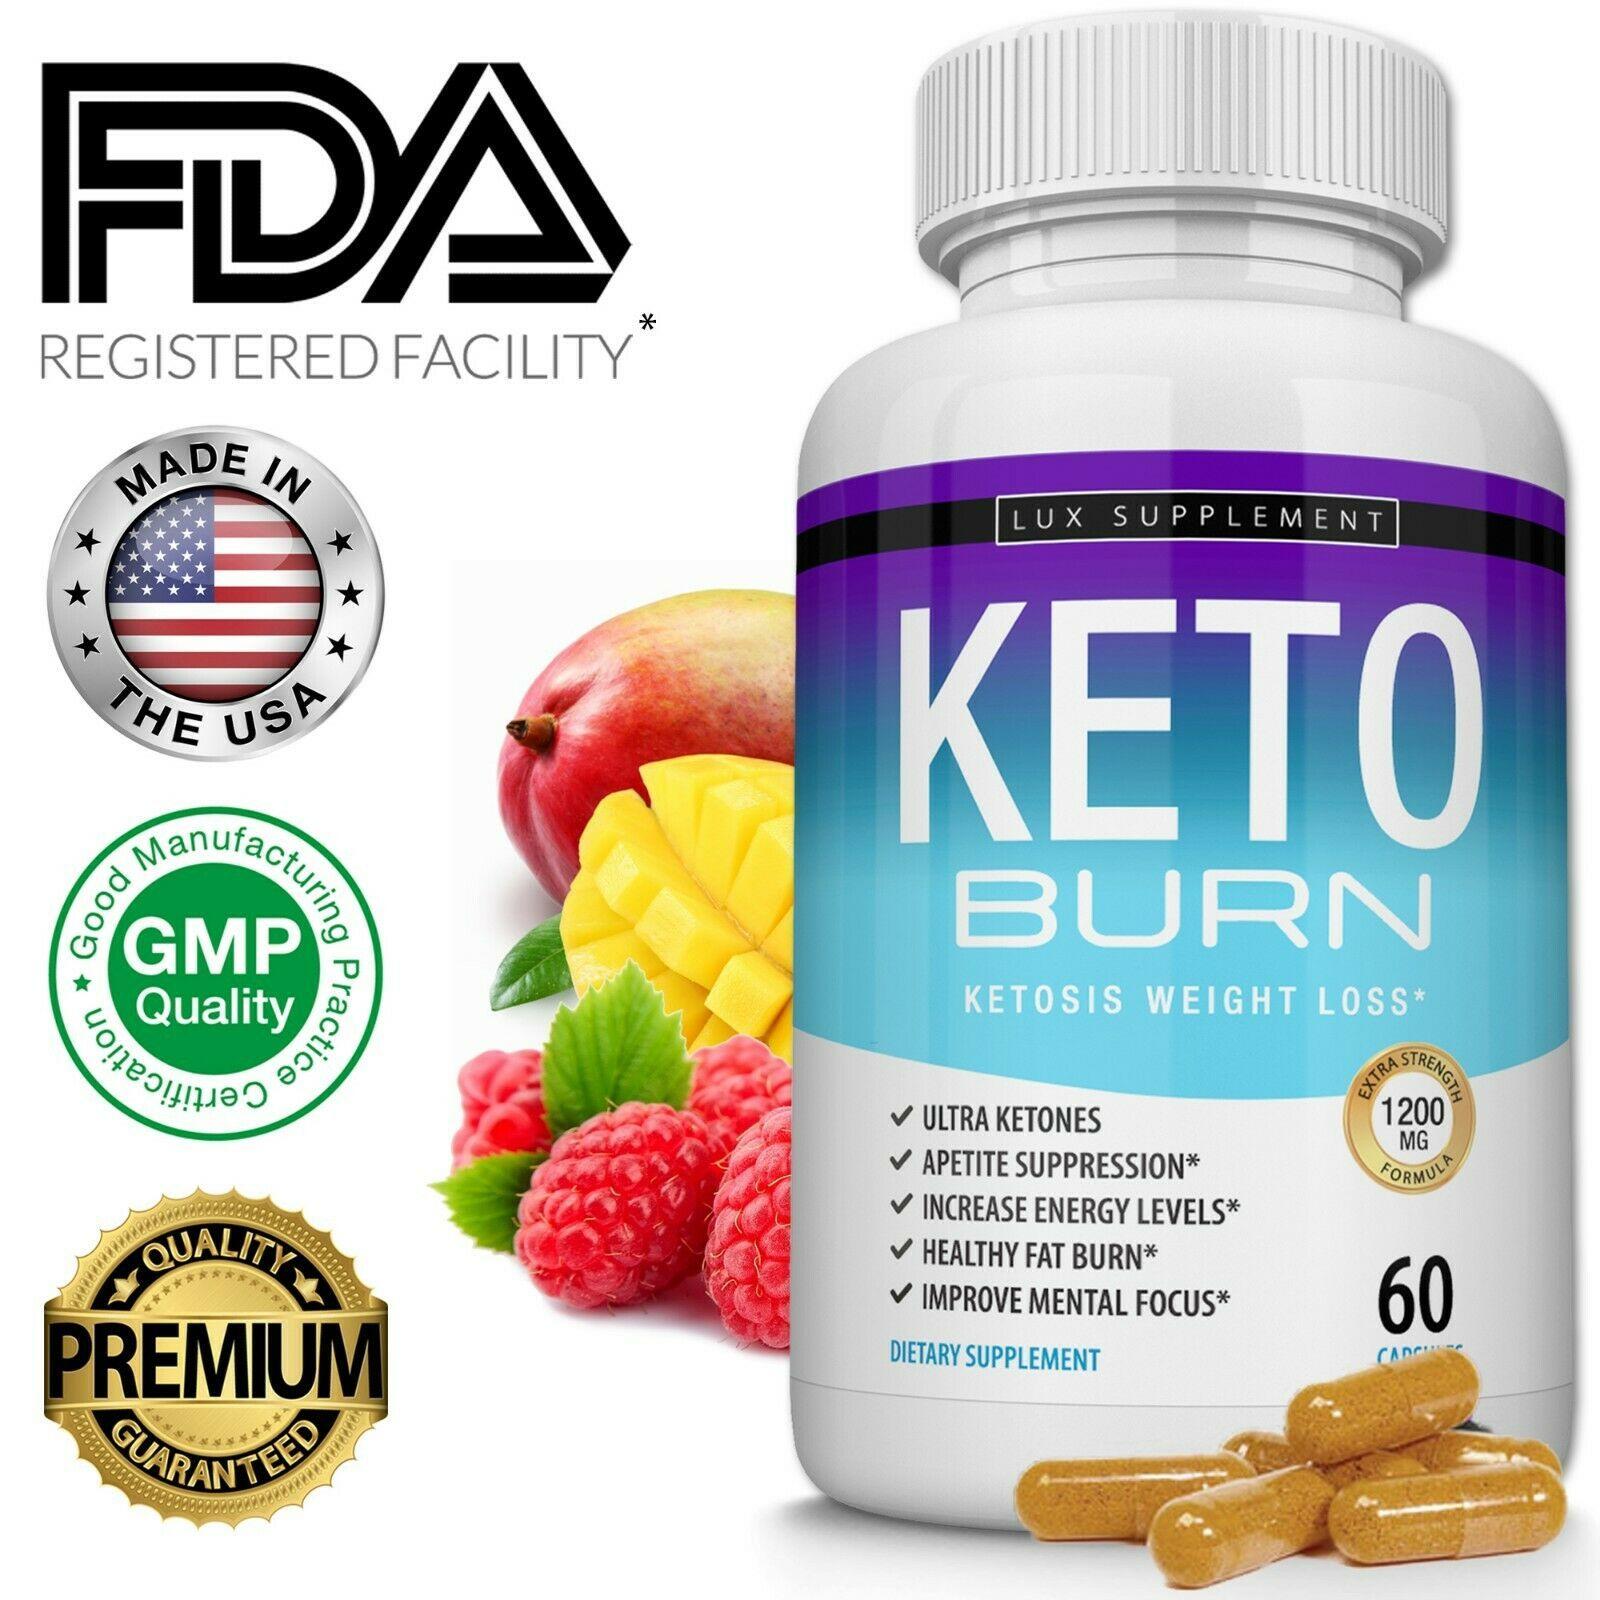 Keto Burn Diet Pills 1200 Mg Ketosis Weight Loss Supplements To Fat